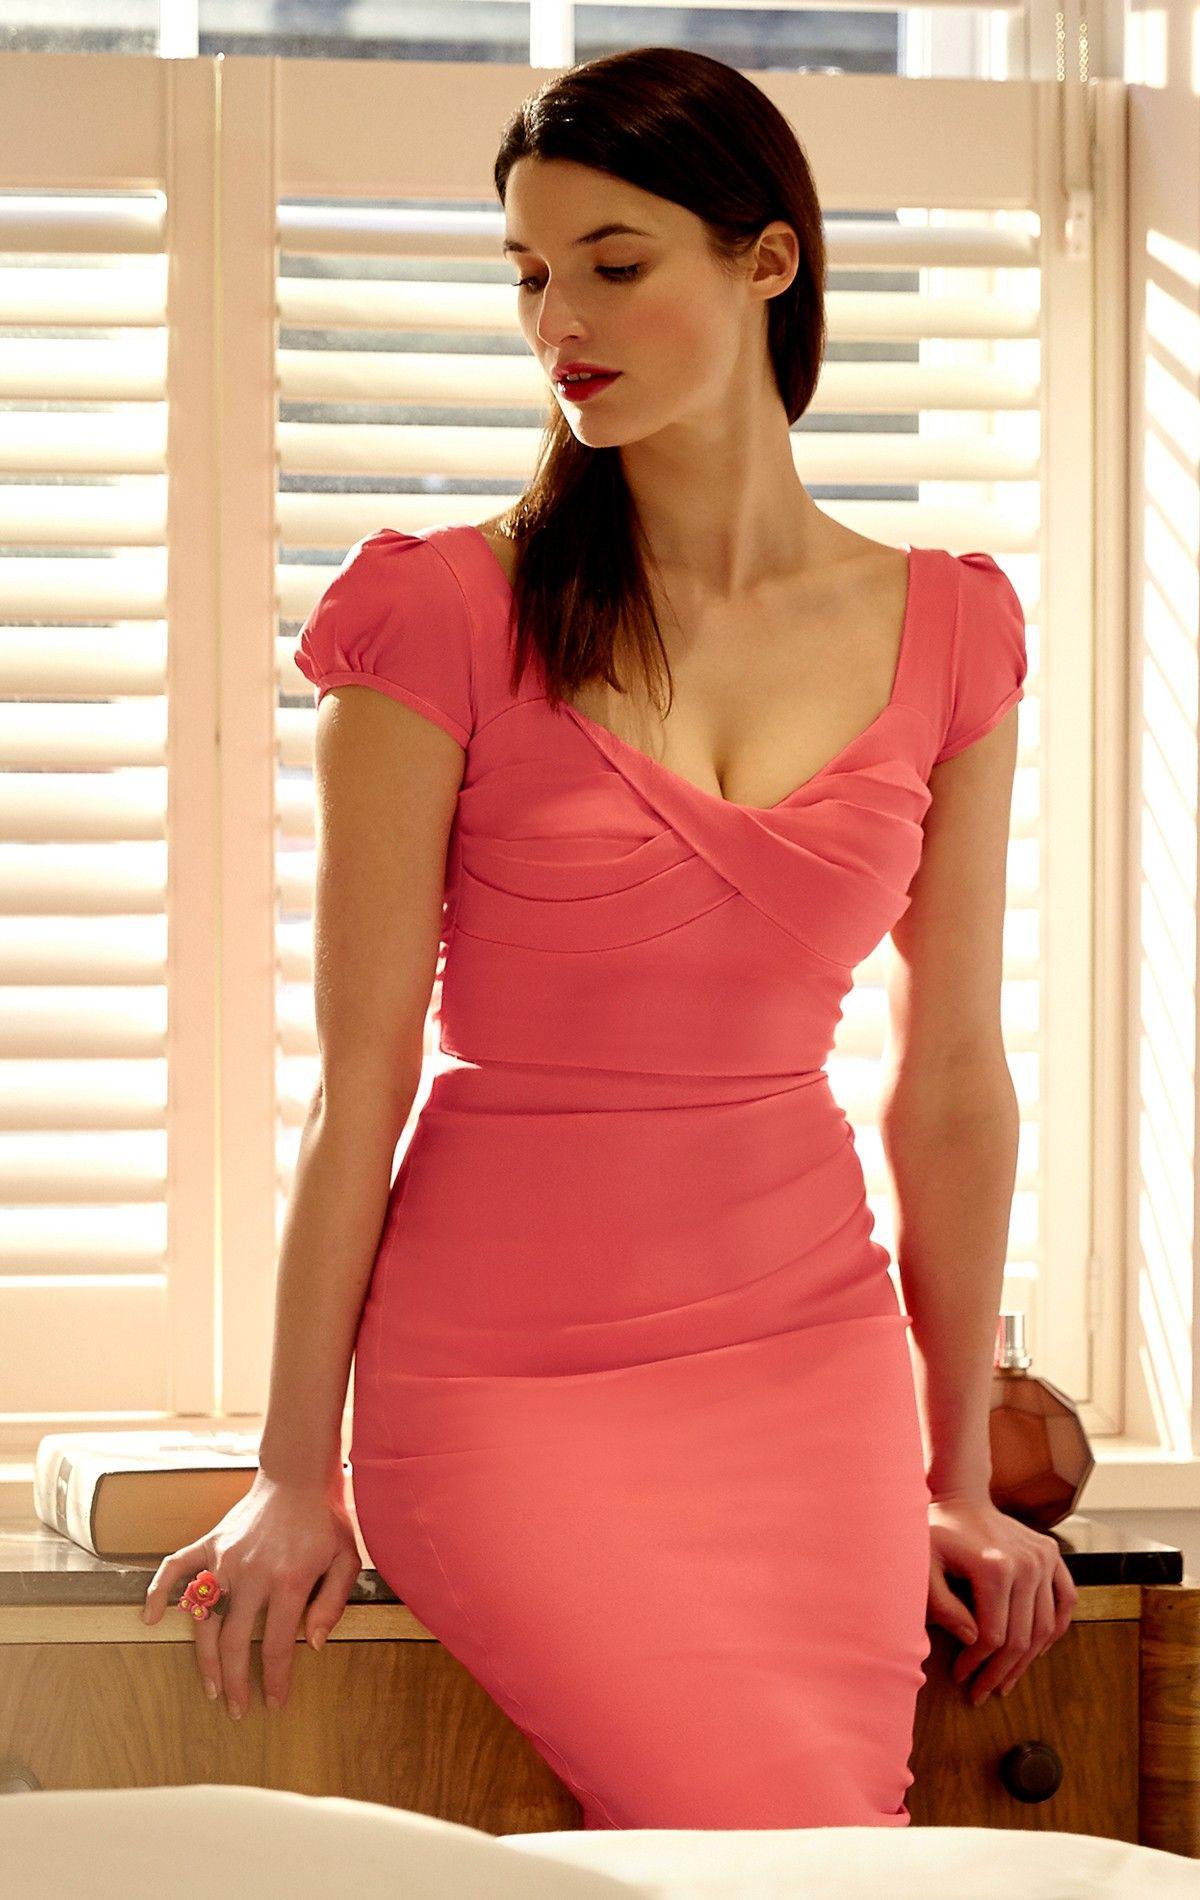 34b86853b61 Bodycon Dress as worn by Nigella Lawson   Susan Sarandon  The Nigella Dress  draws on the vintage charm and feminine glamour of old Hollywood. This sexy  ...